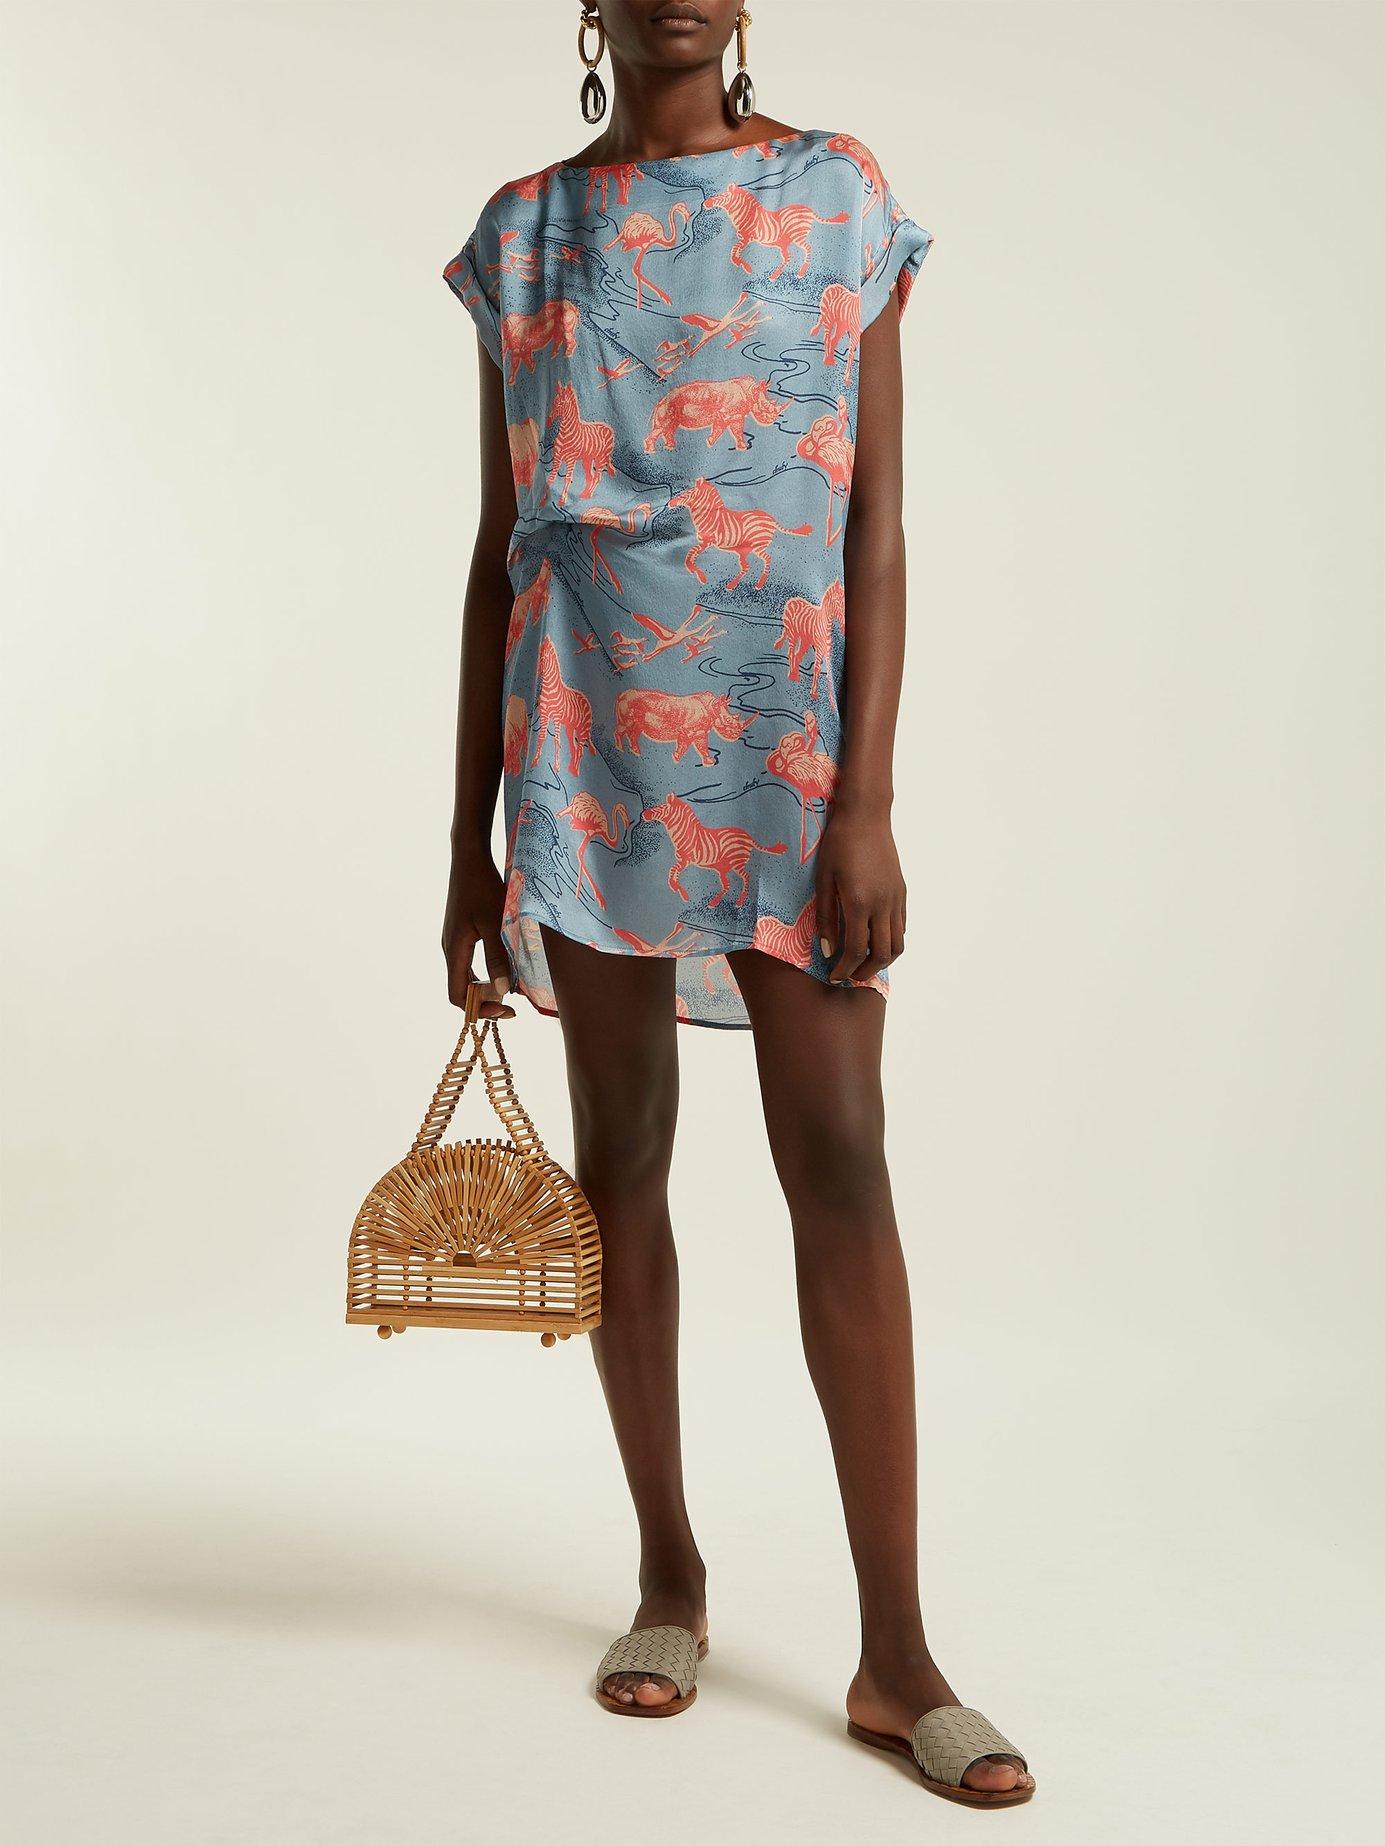 Ebel silk-satin dress by Chufy